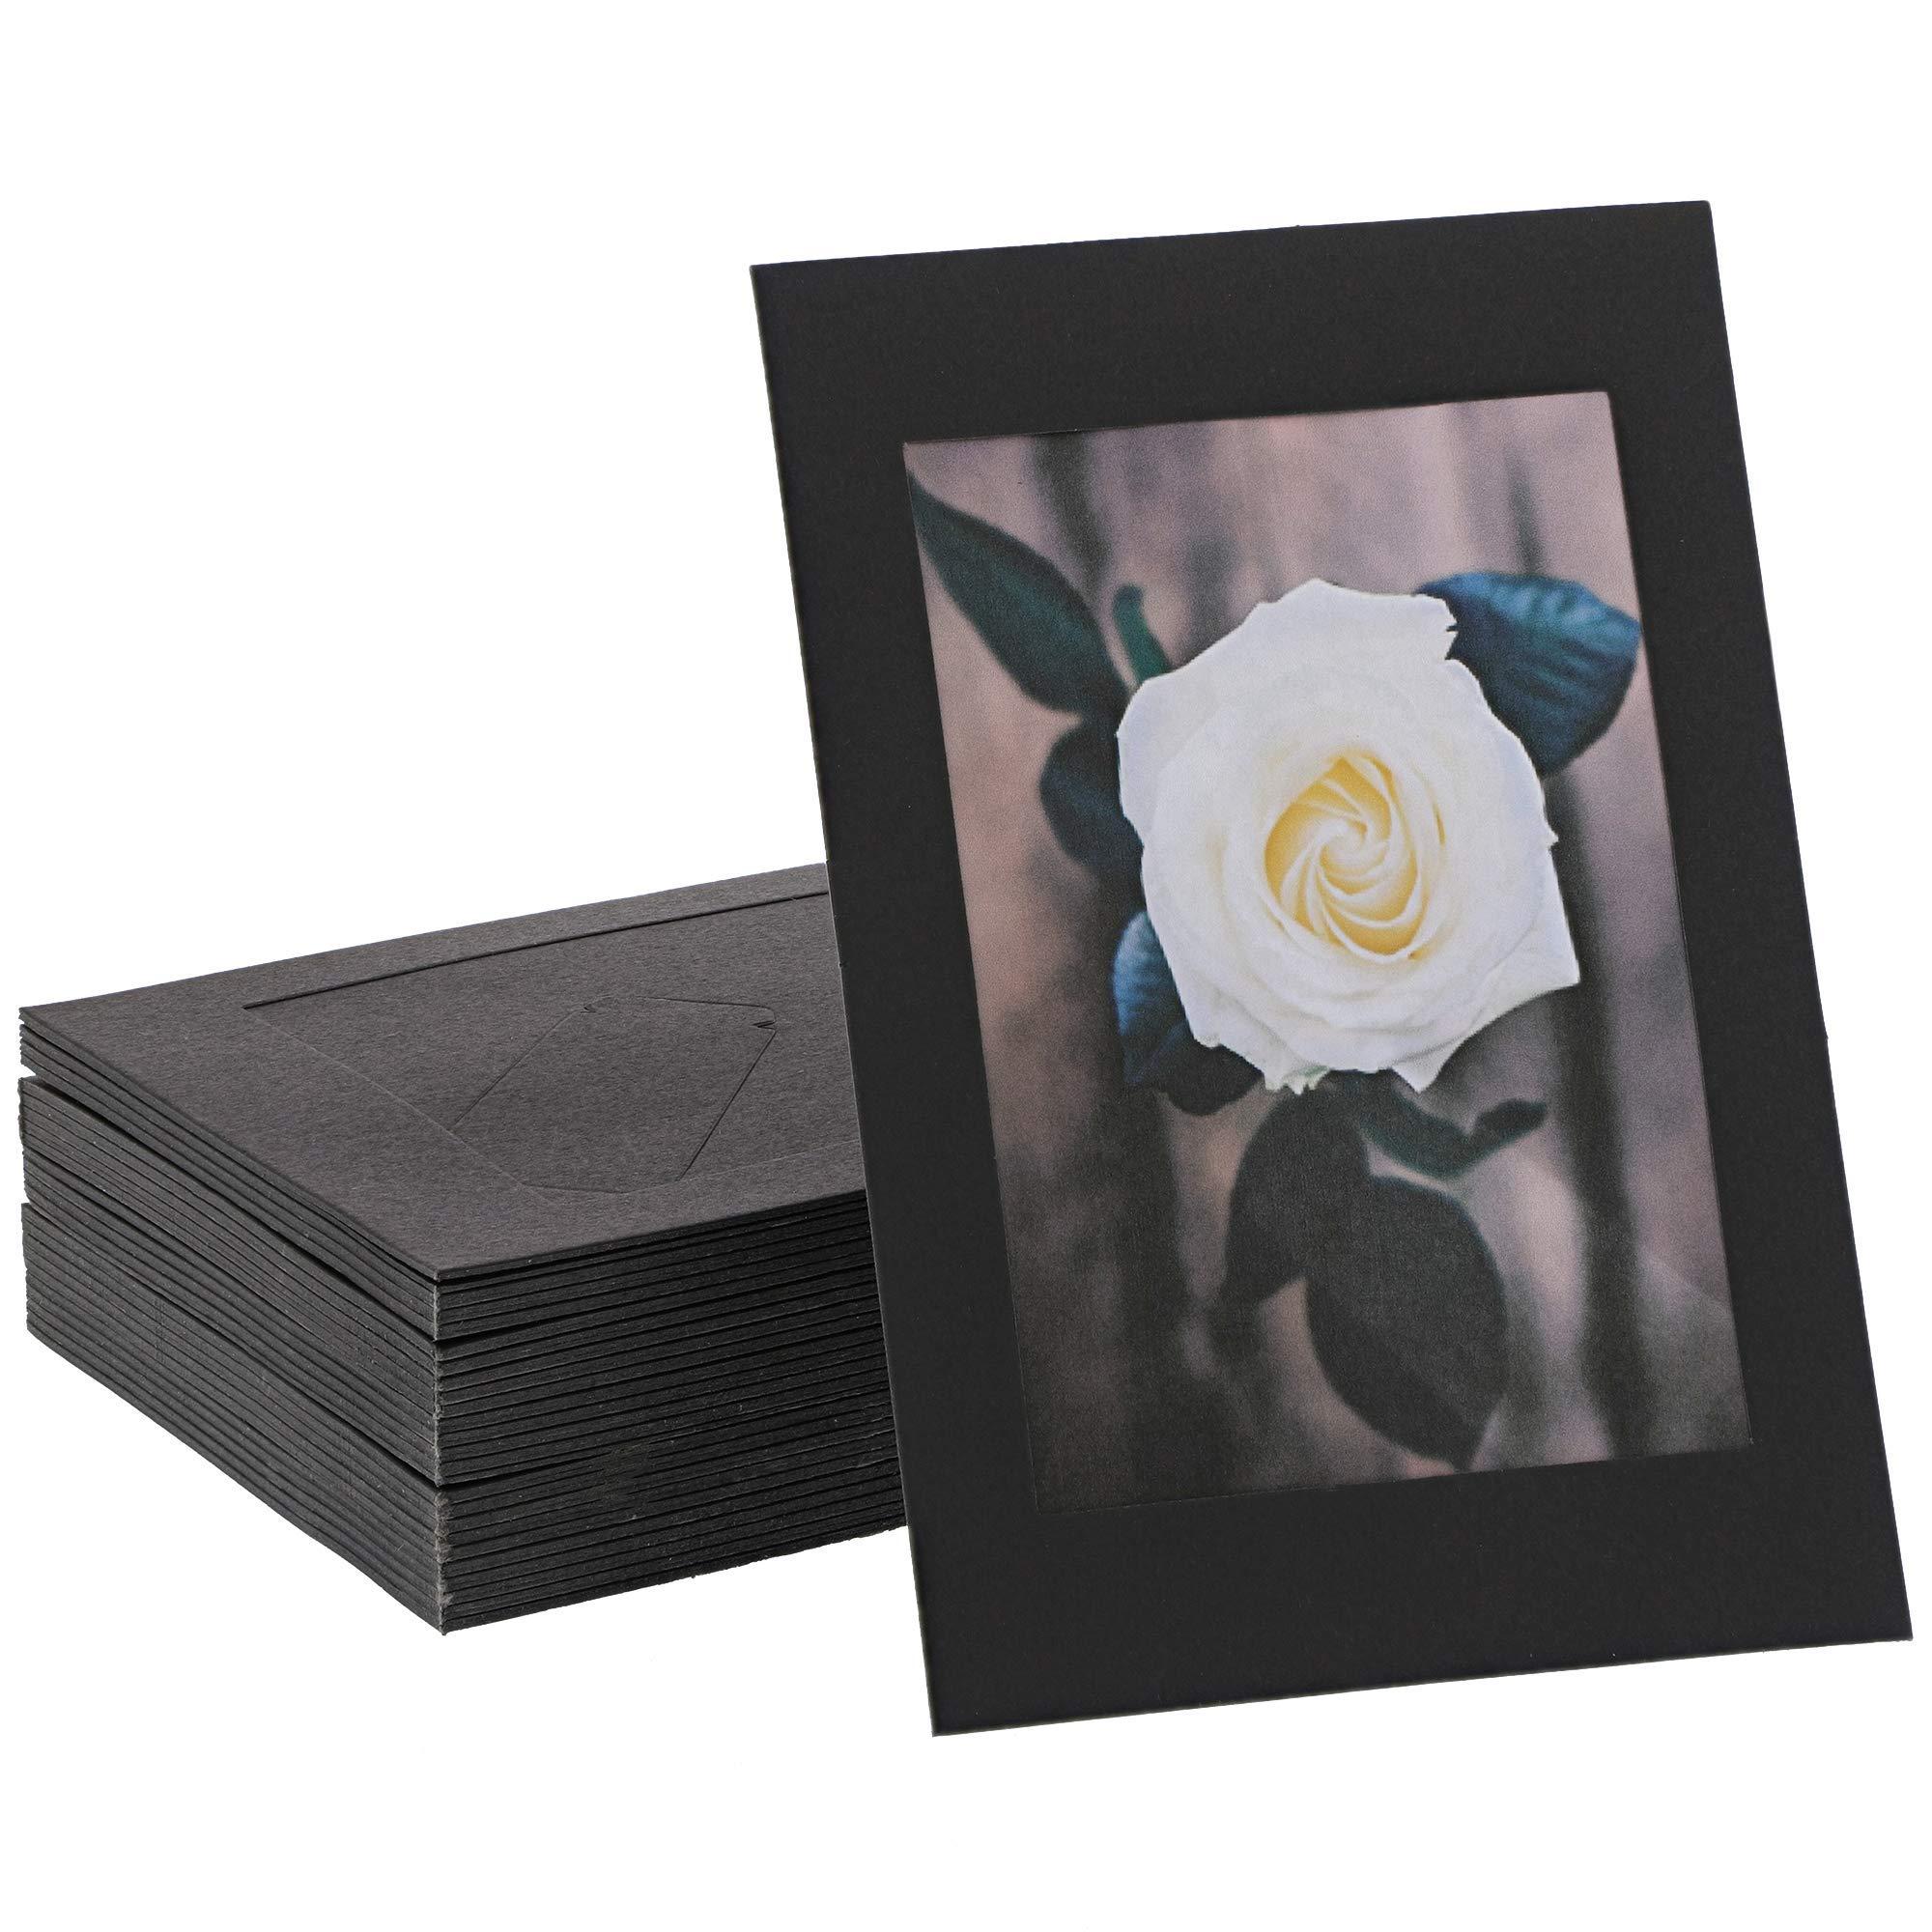 Cardboard Photo Picture Frame Kraft Paper Easel (Black, 4 x 6 In, 50 Pack)